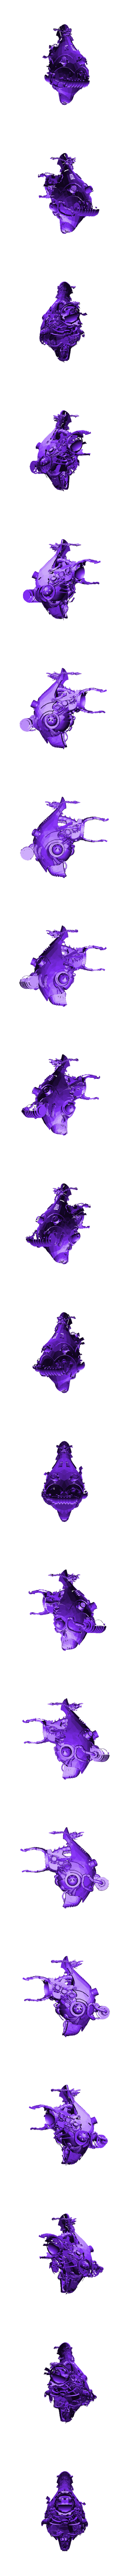 Grimdark_Kastelan_with_zealous_campfire.stl Download free STL file Grimdark Chrono Trigger Bits • 3D printer object, ErikTheHeretek